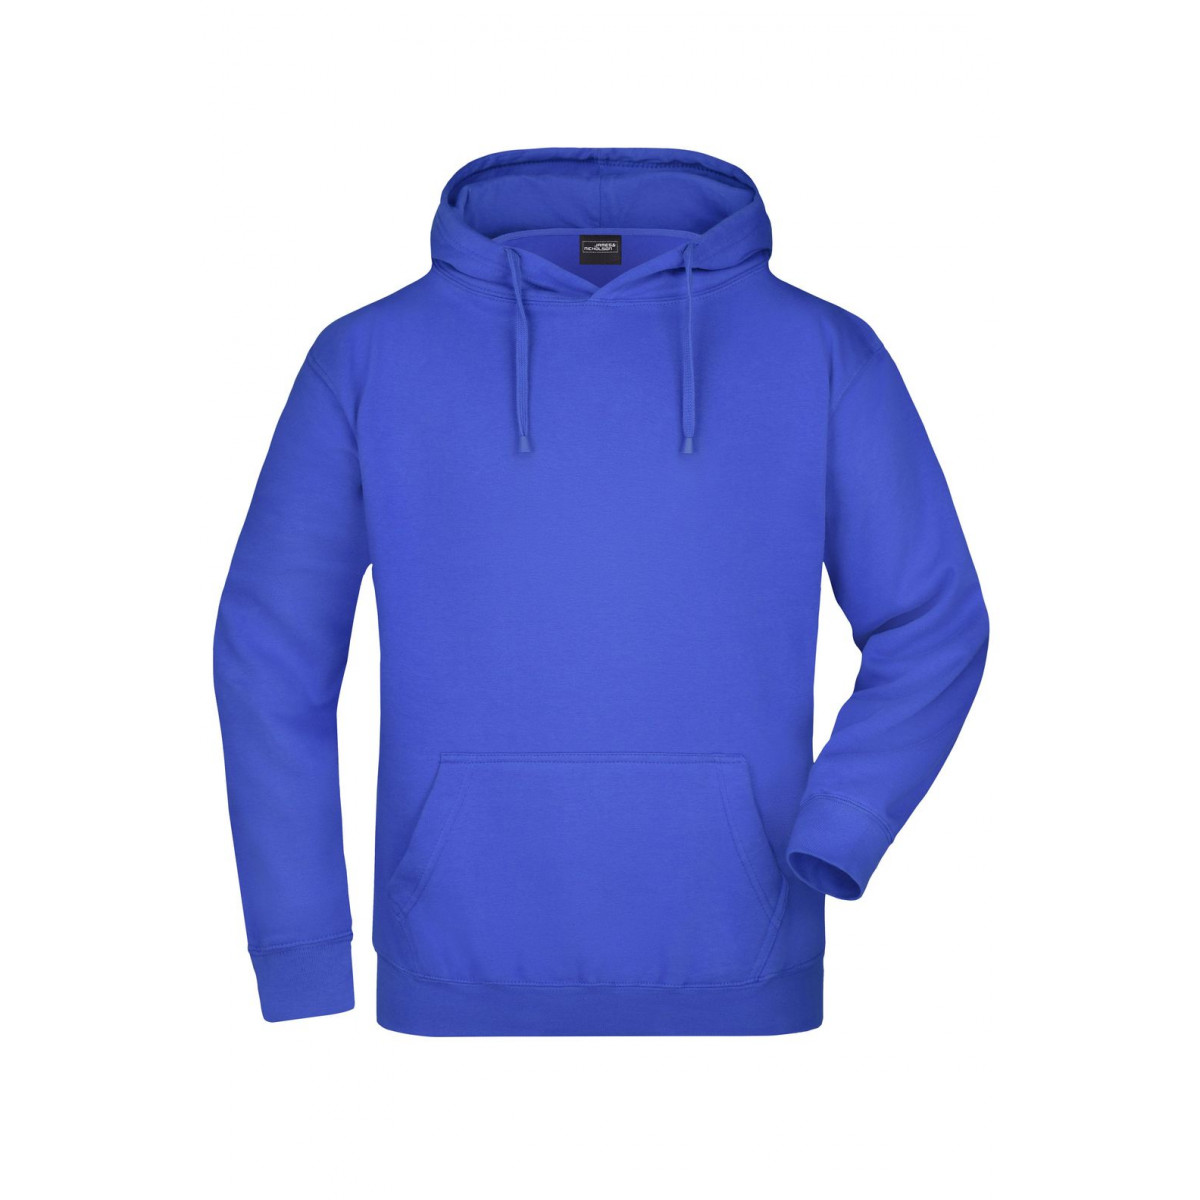 Толстовка мужская JN047 Hooded Sweat - Ярко-синий